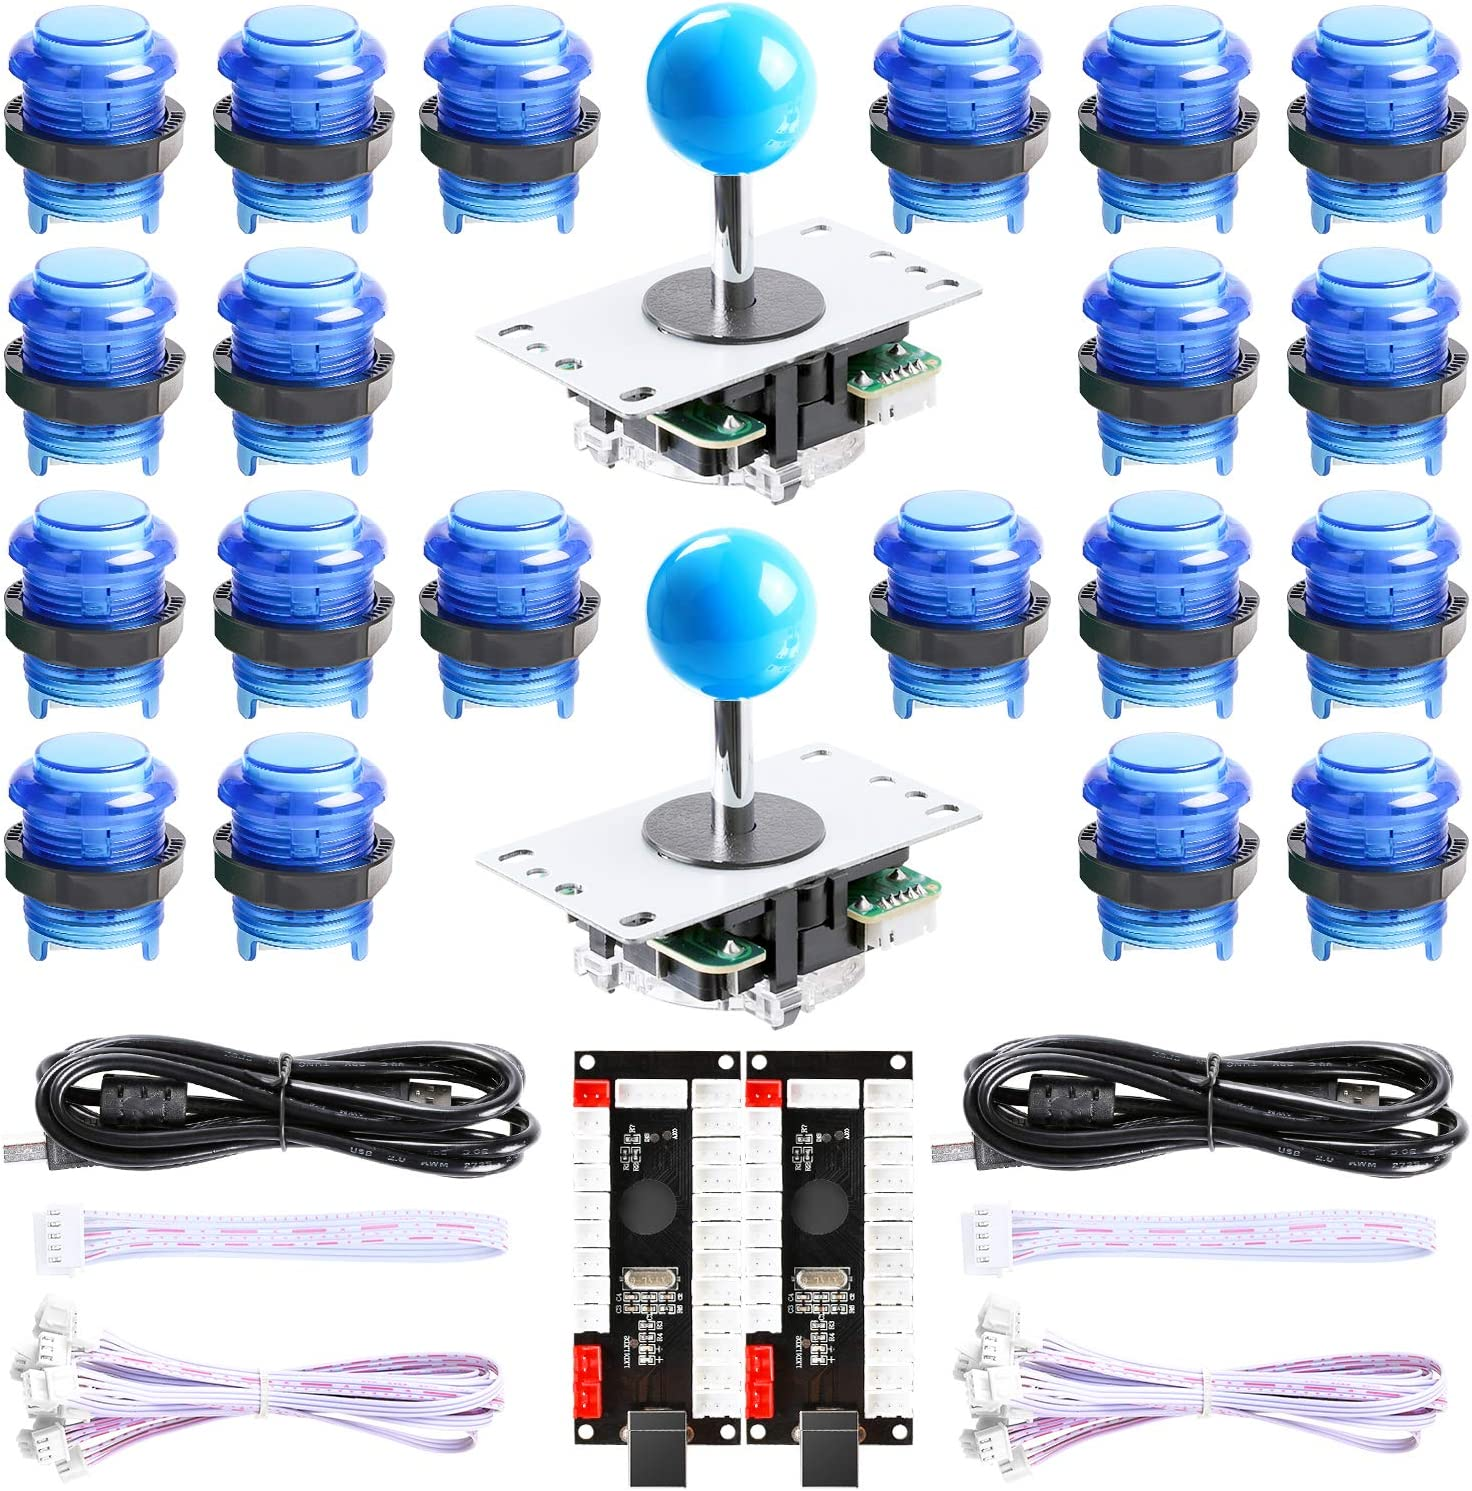 Hikig New Updated Version 2-Player LED Arcade DIY Kit - 2X Zero Delay LED USB Encoder + 2X Arcade Joystick + 20x LED Arcade Buttons for MAME, PC, Windows, Raspberry Pi, Arcade1Up (All Blue Kit)